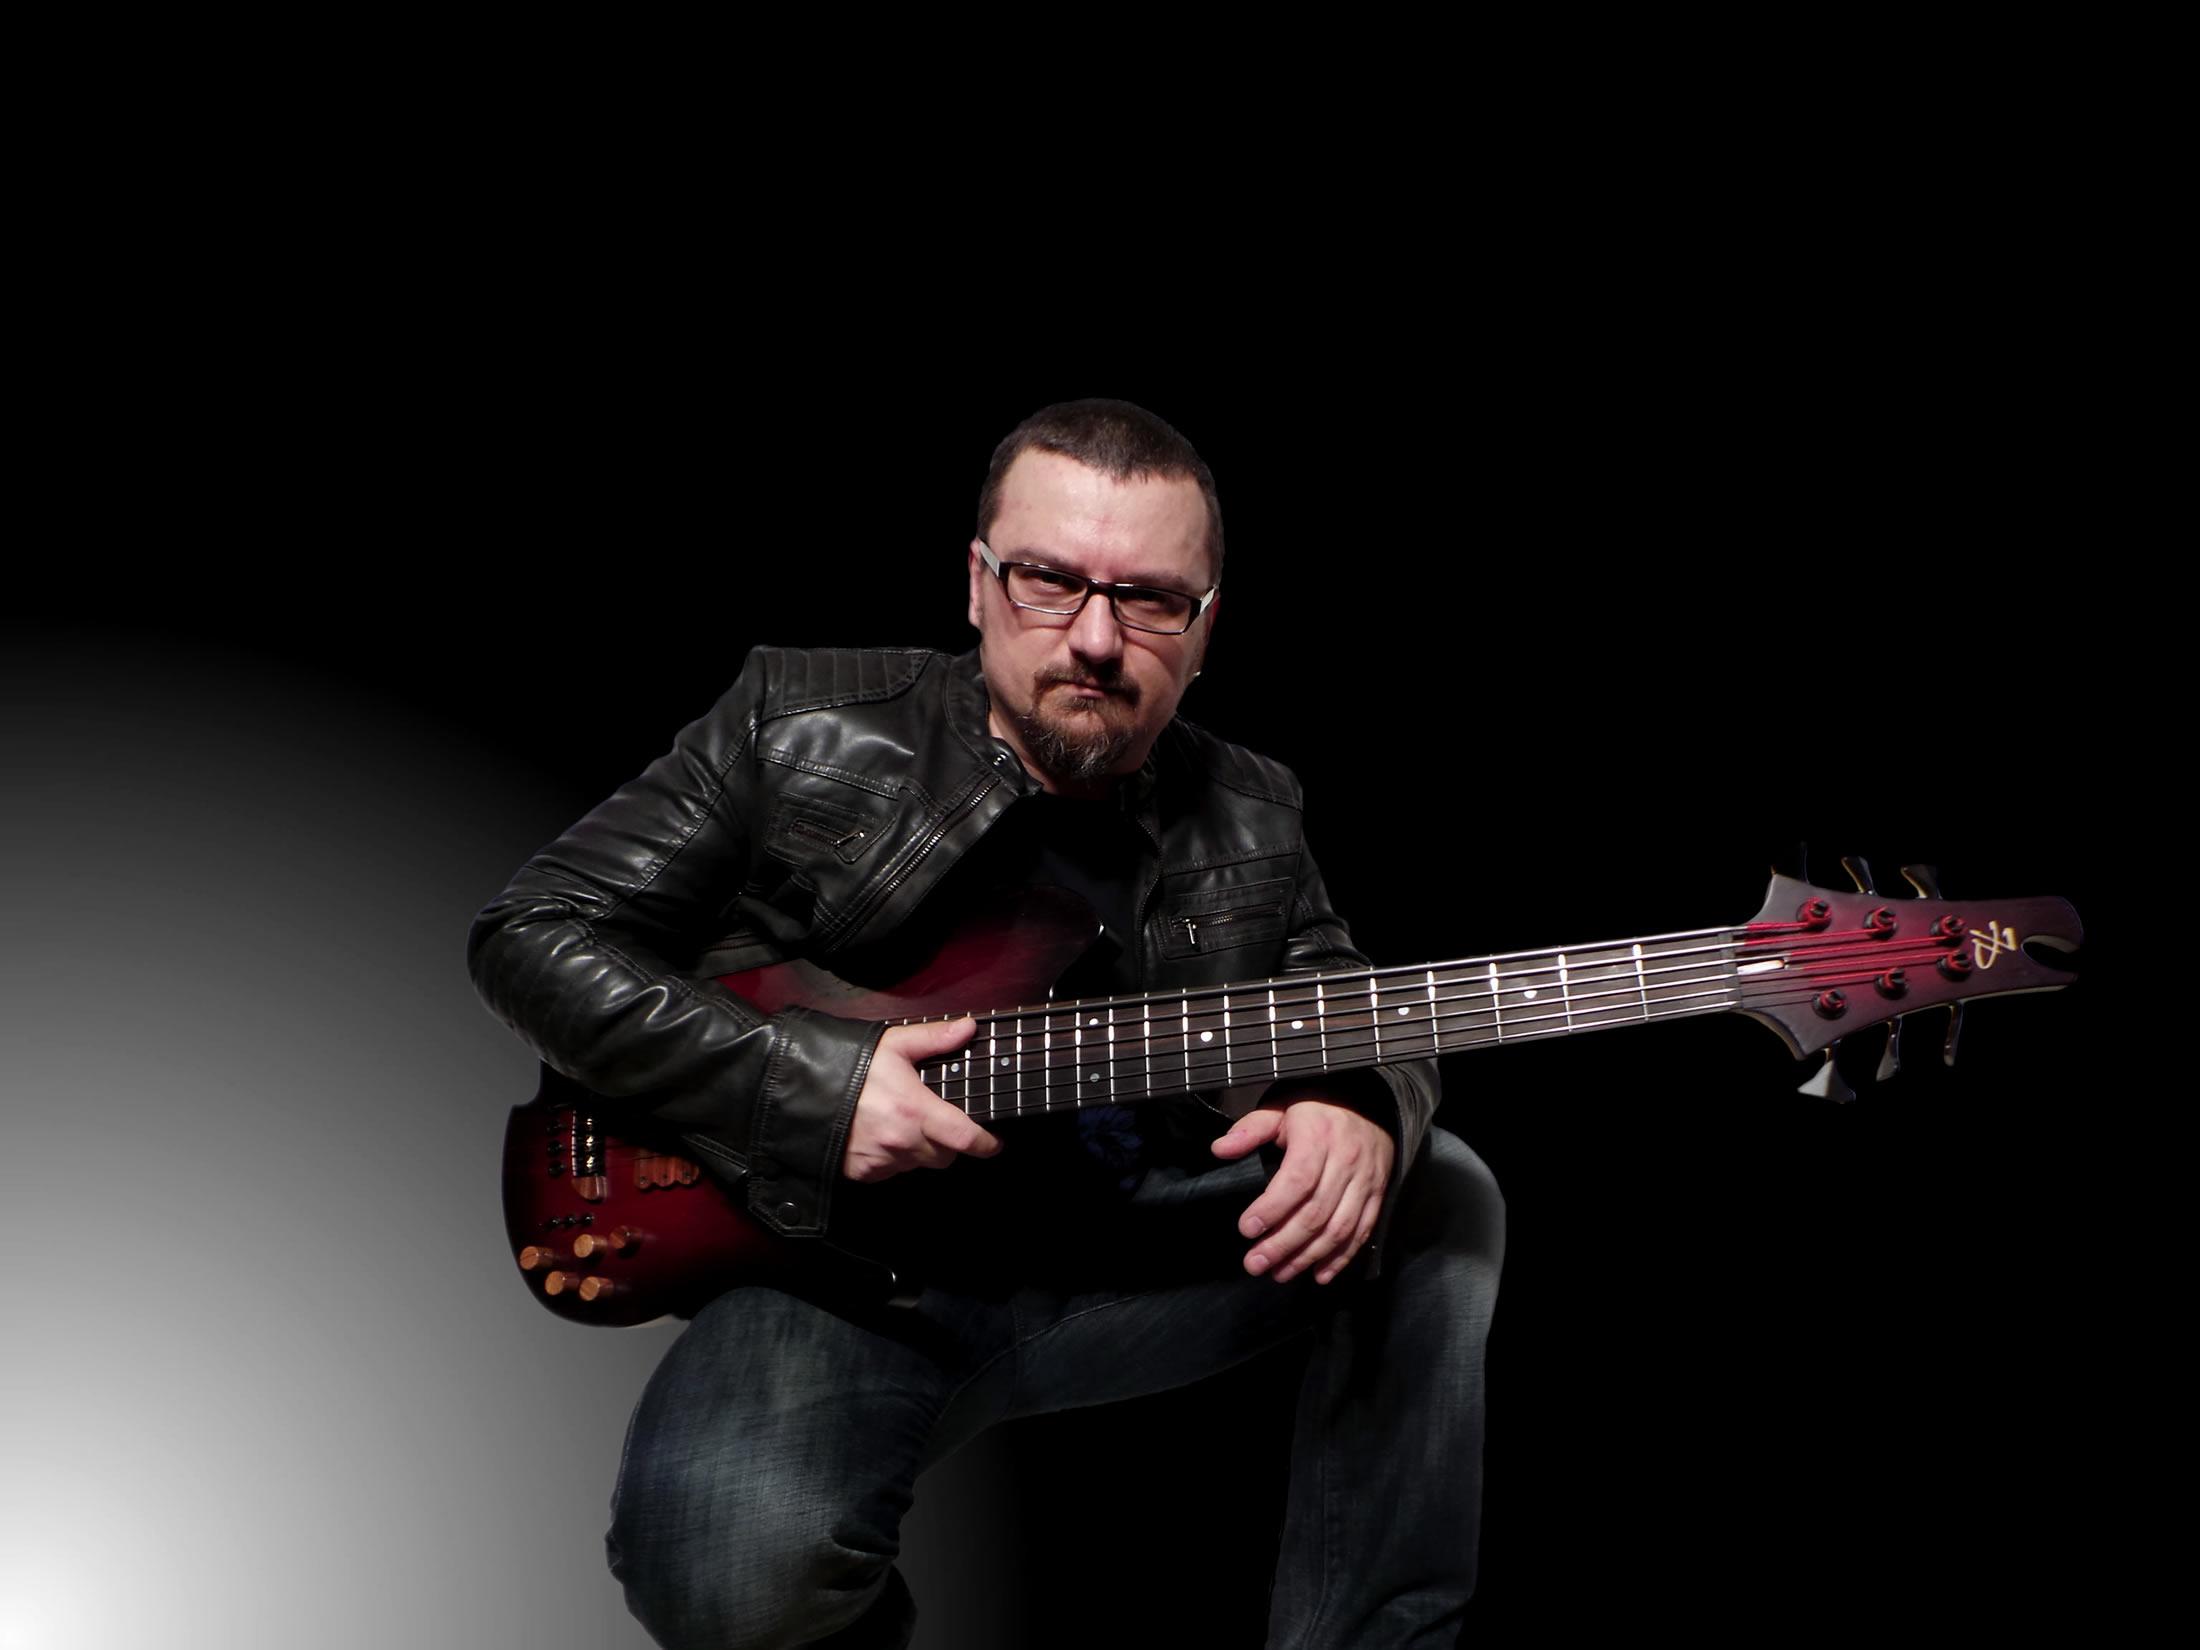 Krzysztof Pabian | bassist, improviser, composer, producer